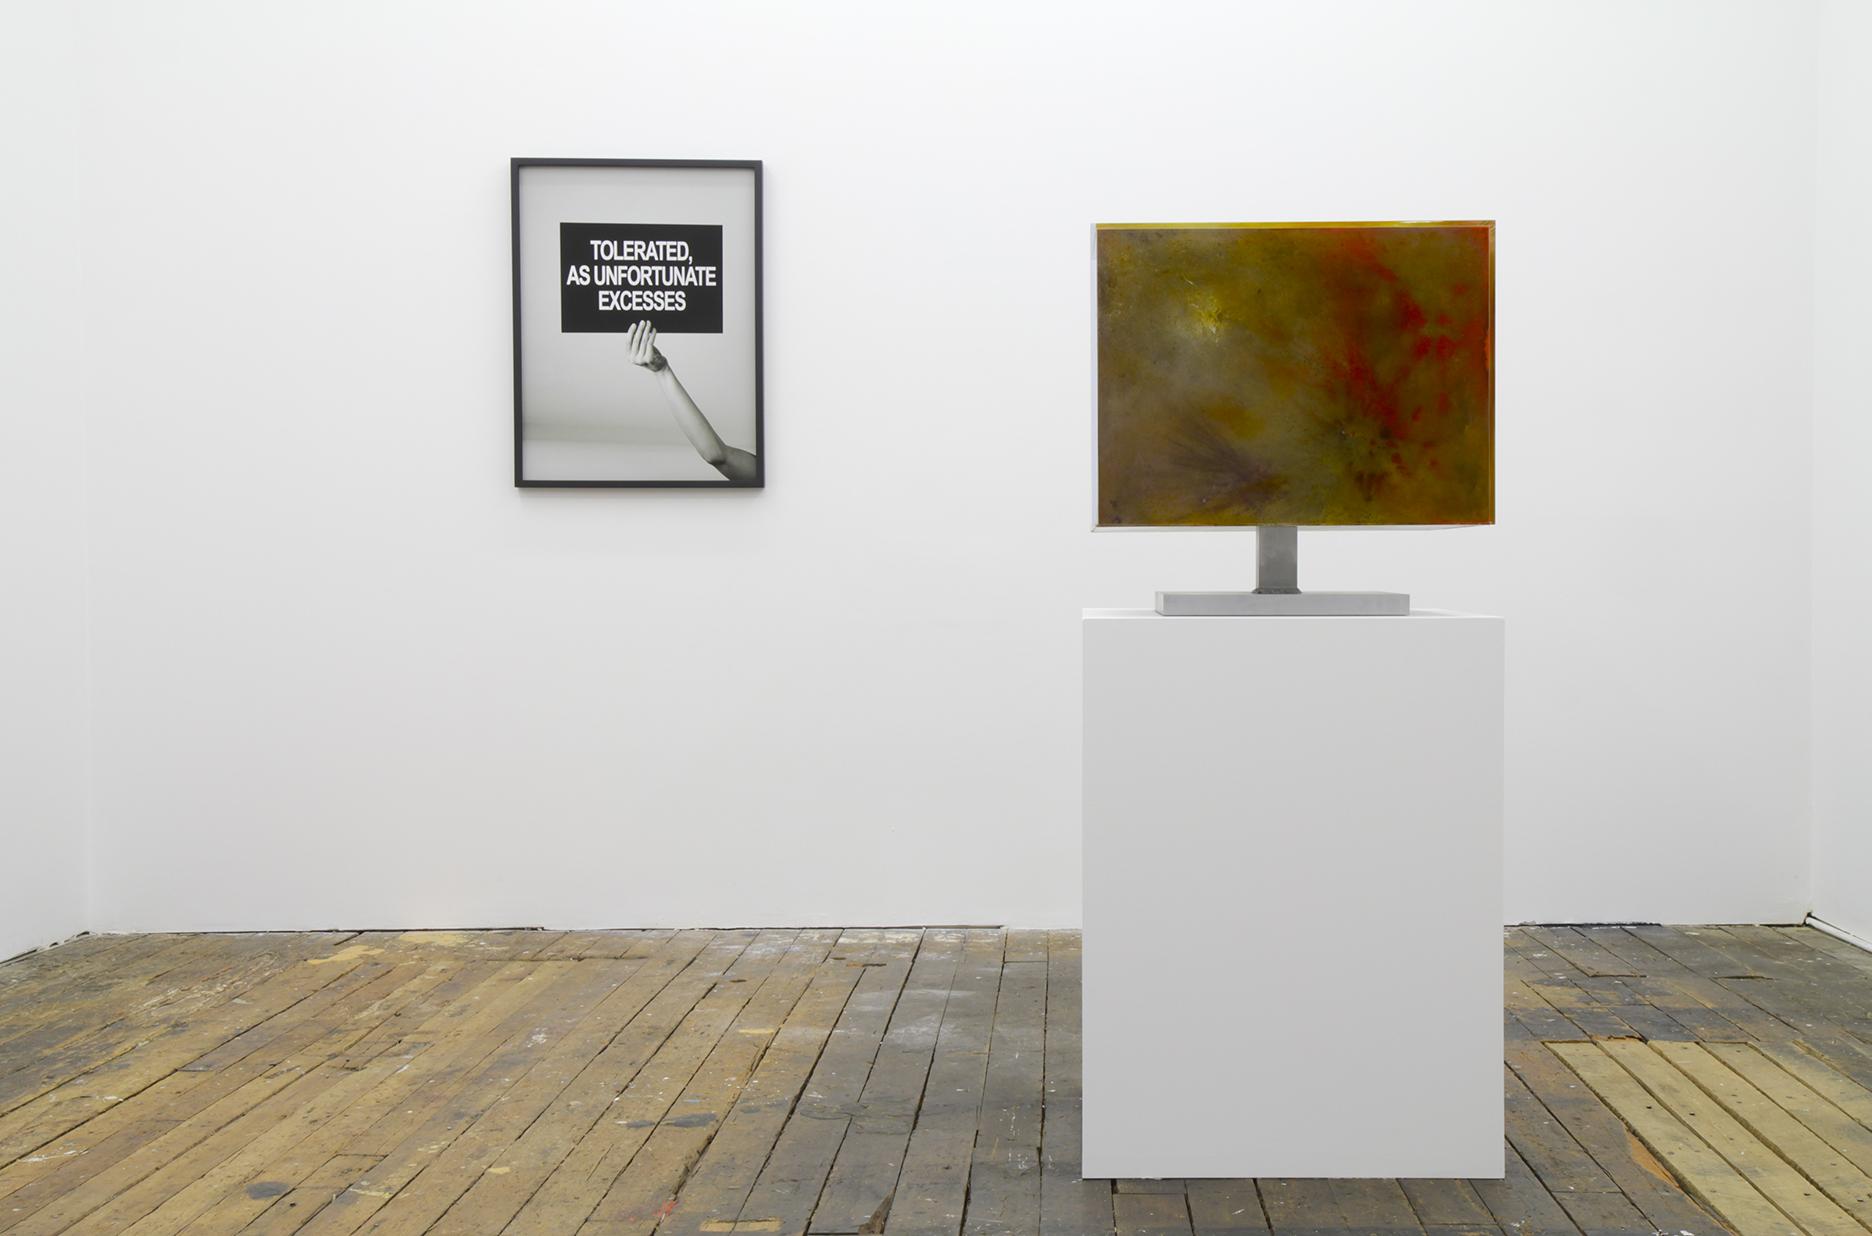 installation view of modern ensembles by geof oppenheimer 2010